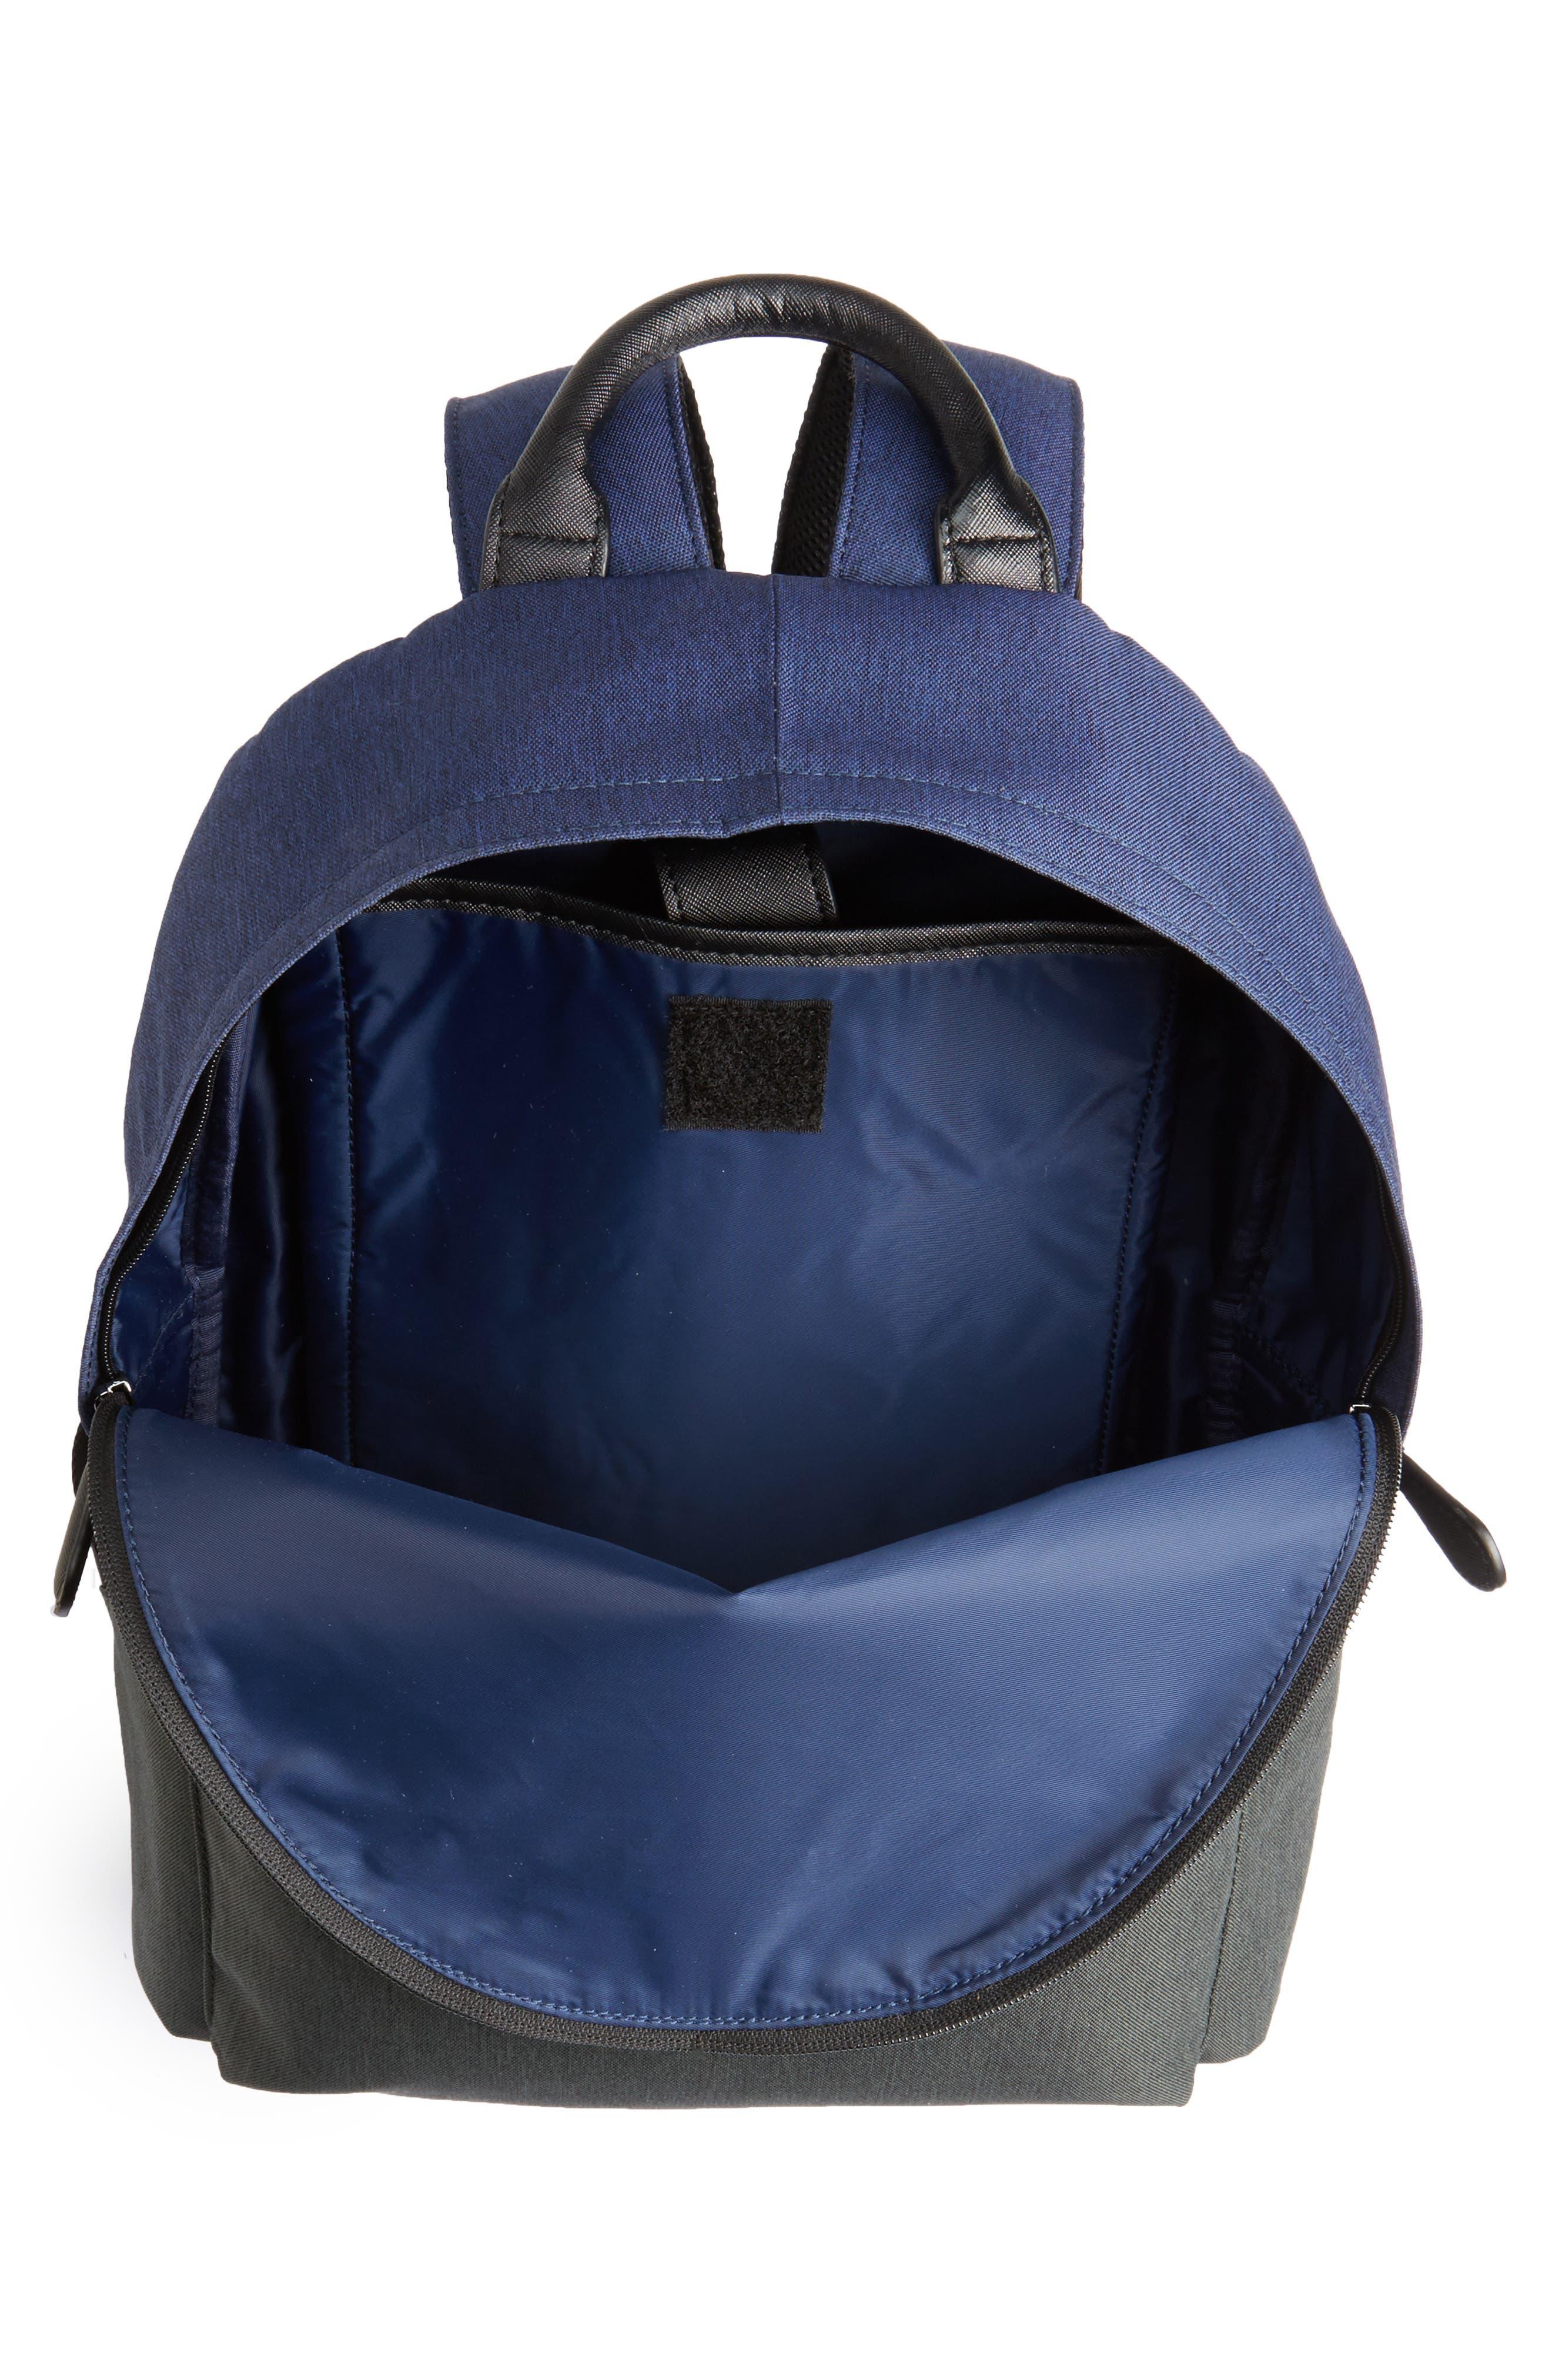 Zirabi Backpack,                             Alternate thumbnail 8, color,